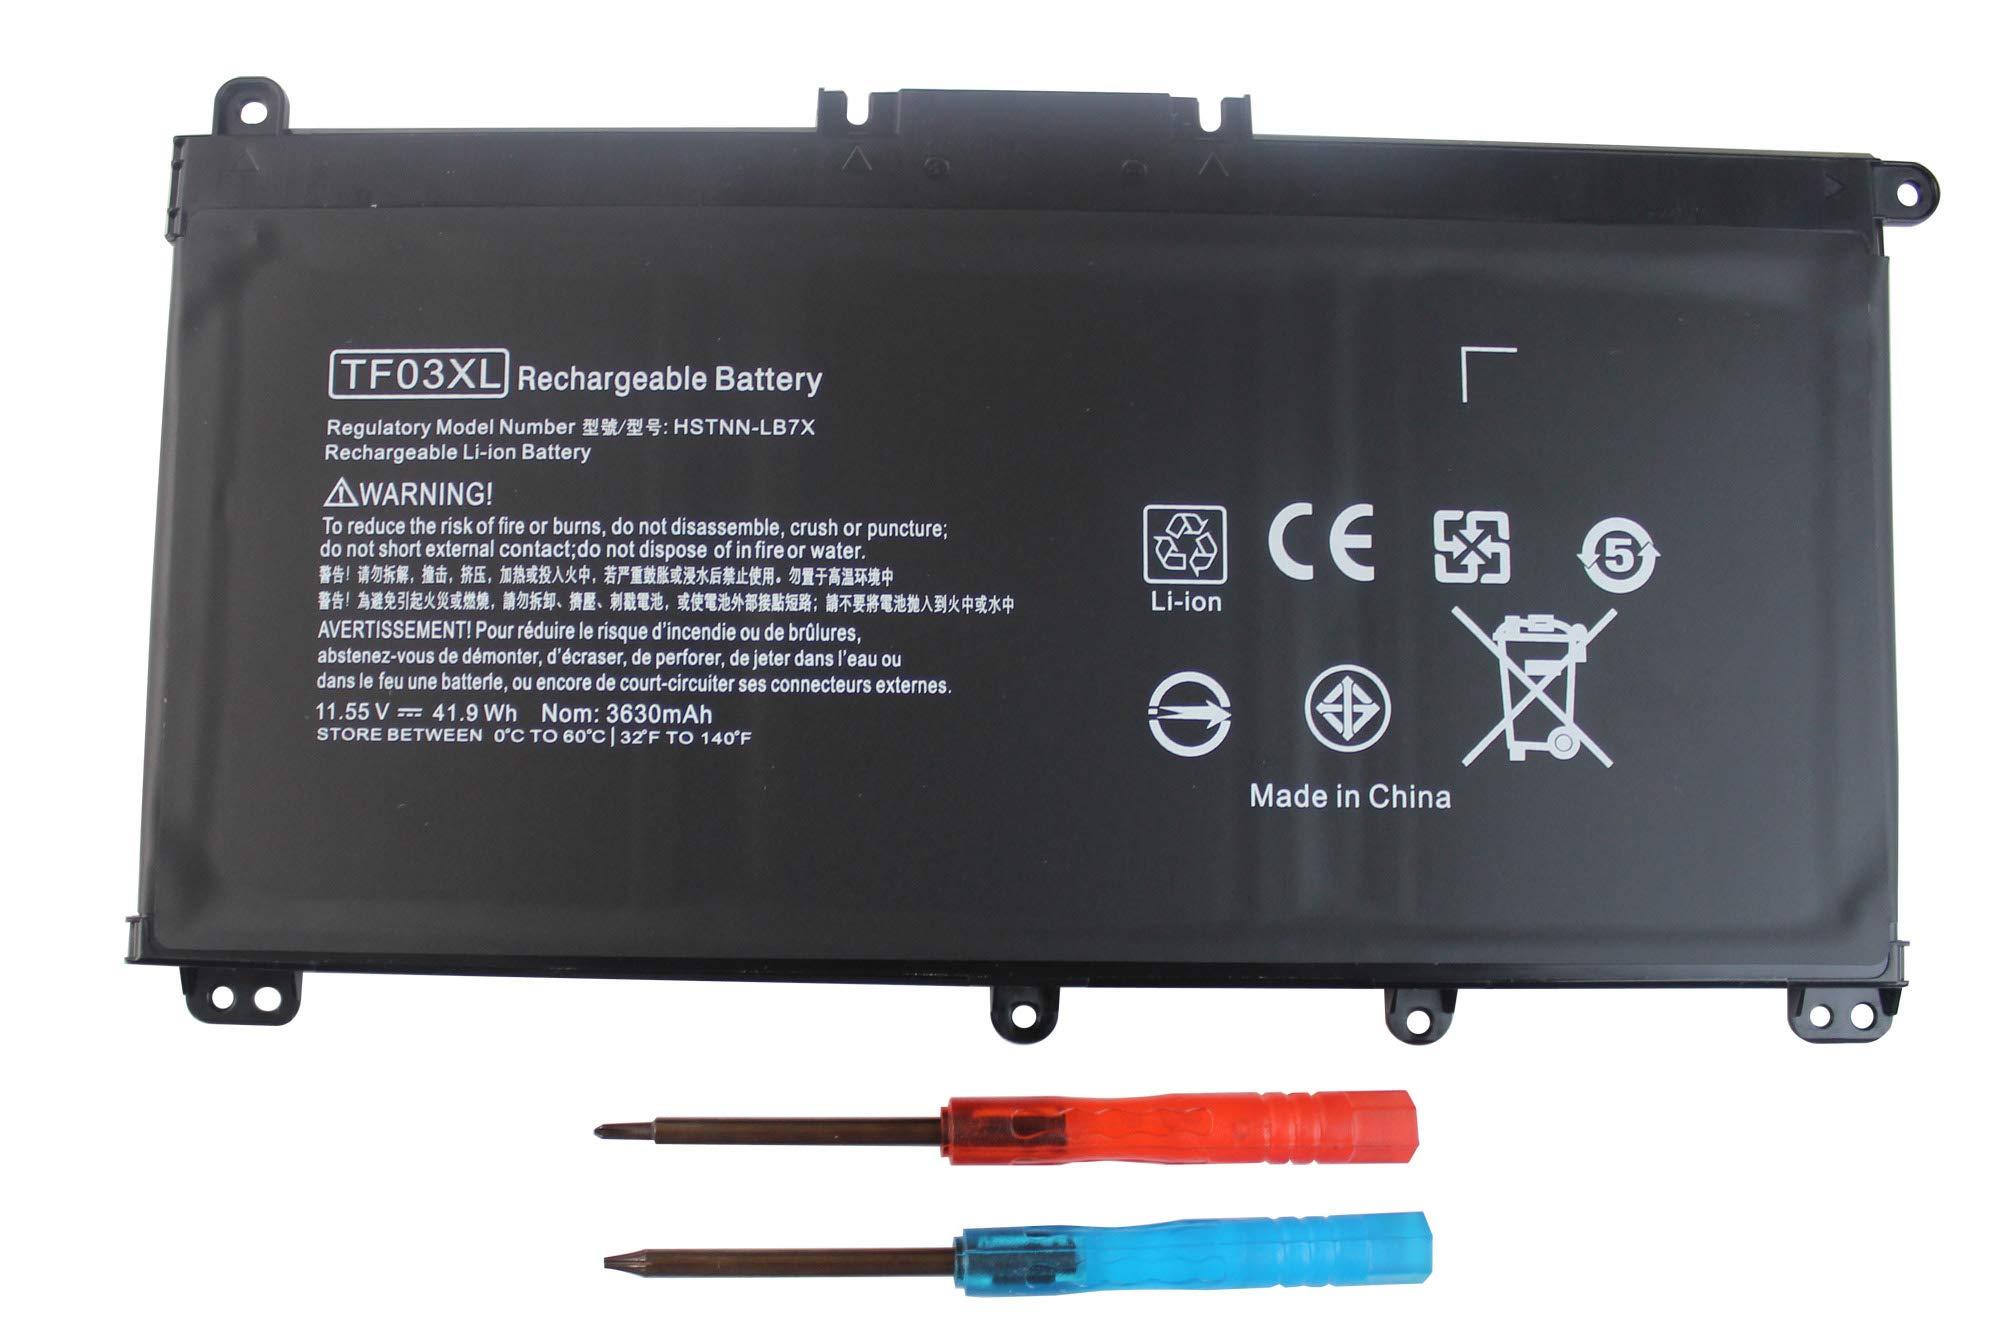 Angwel TF03XL Laptop Battery for HP Pavilion 15-CC 15-CD 17-AR Series, Fit for HP 920046-121 920046-421 HSTNN-IB7Y HSTNN-LB7J TPN-Q188 TPN-Q189 Series[11.55V 41.9WH] — 1 Year Warranty